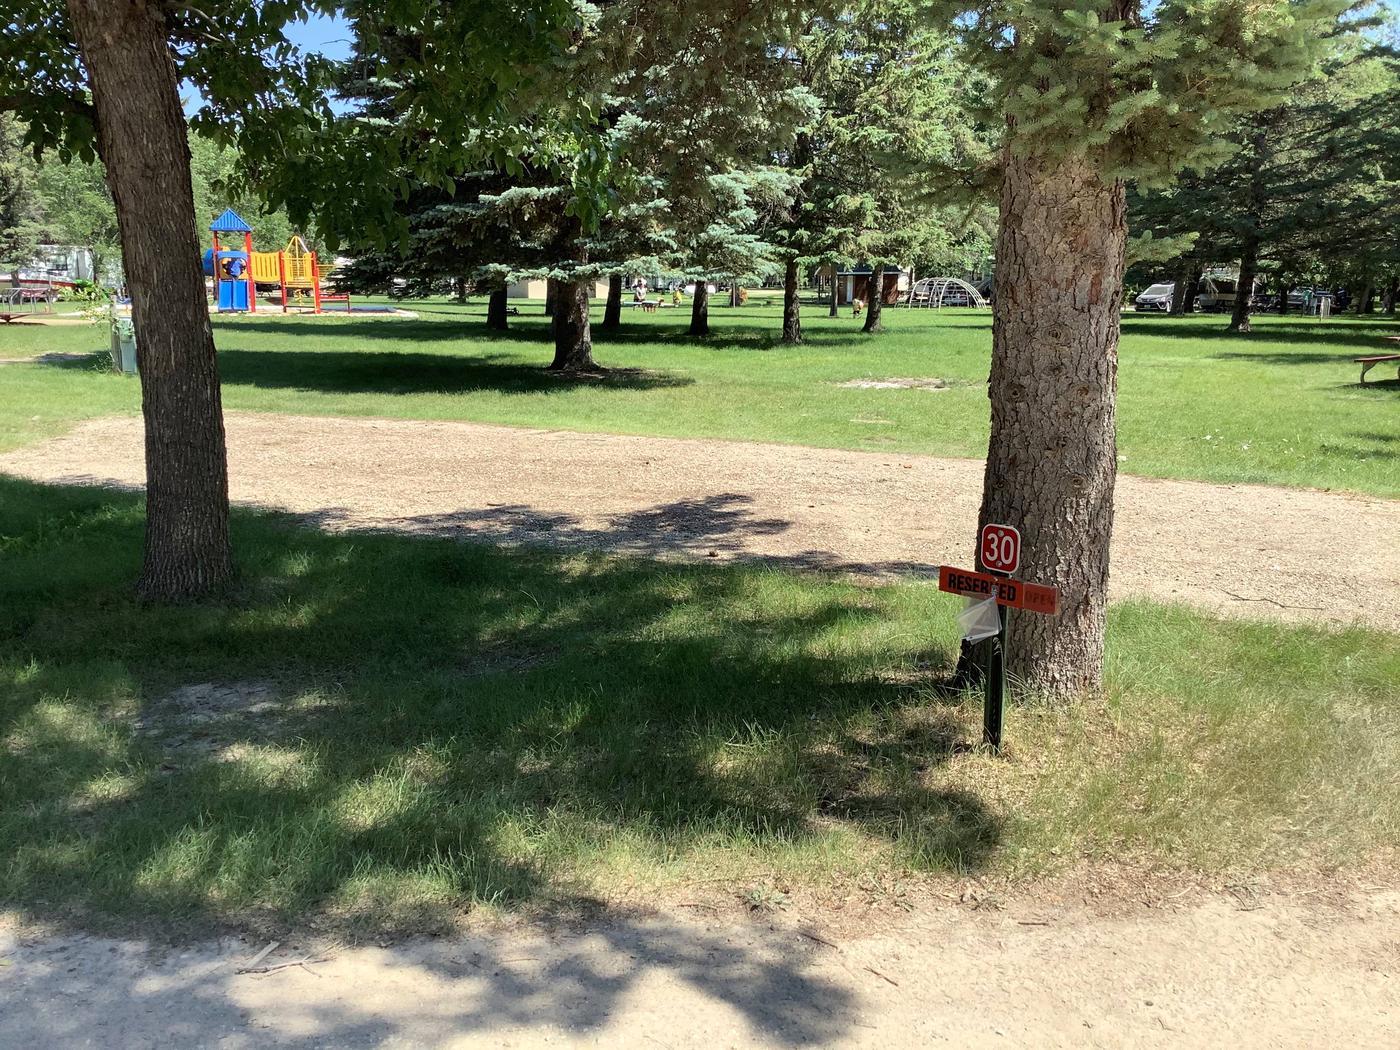 Family friendly location next to playground.Site 30